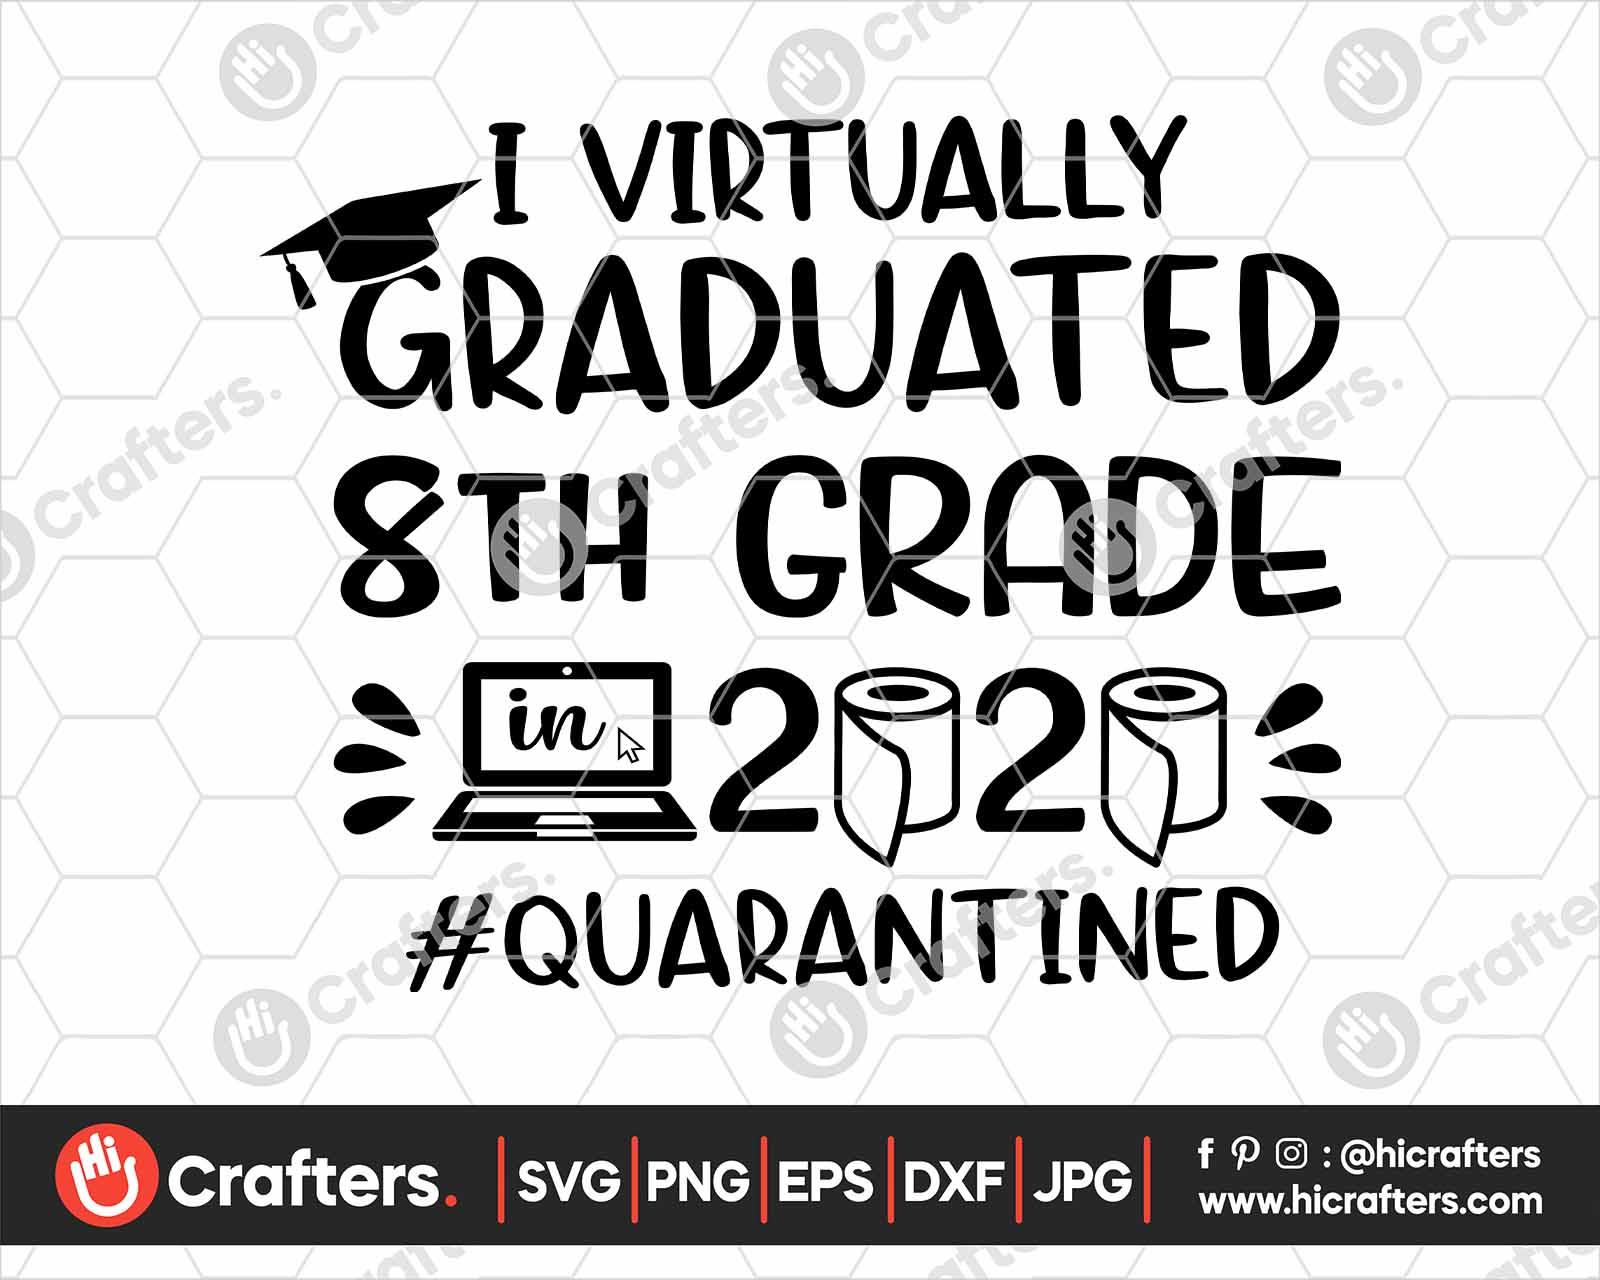 I Virtually Graduated 8th Grade Svg 8th Grade Graduation